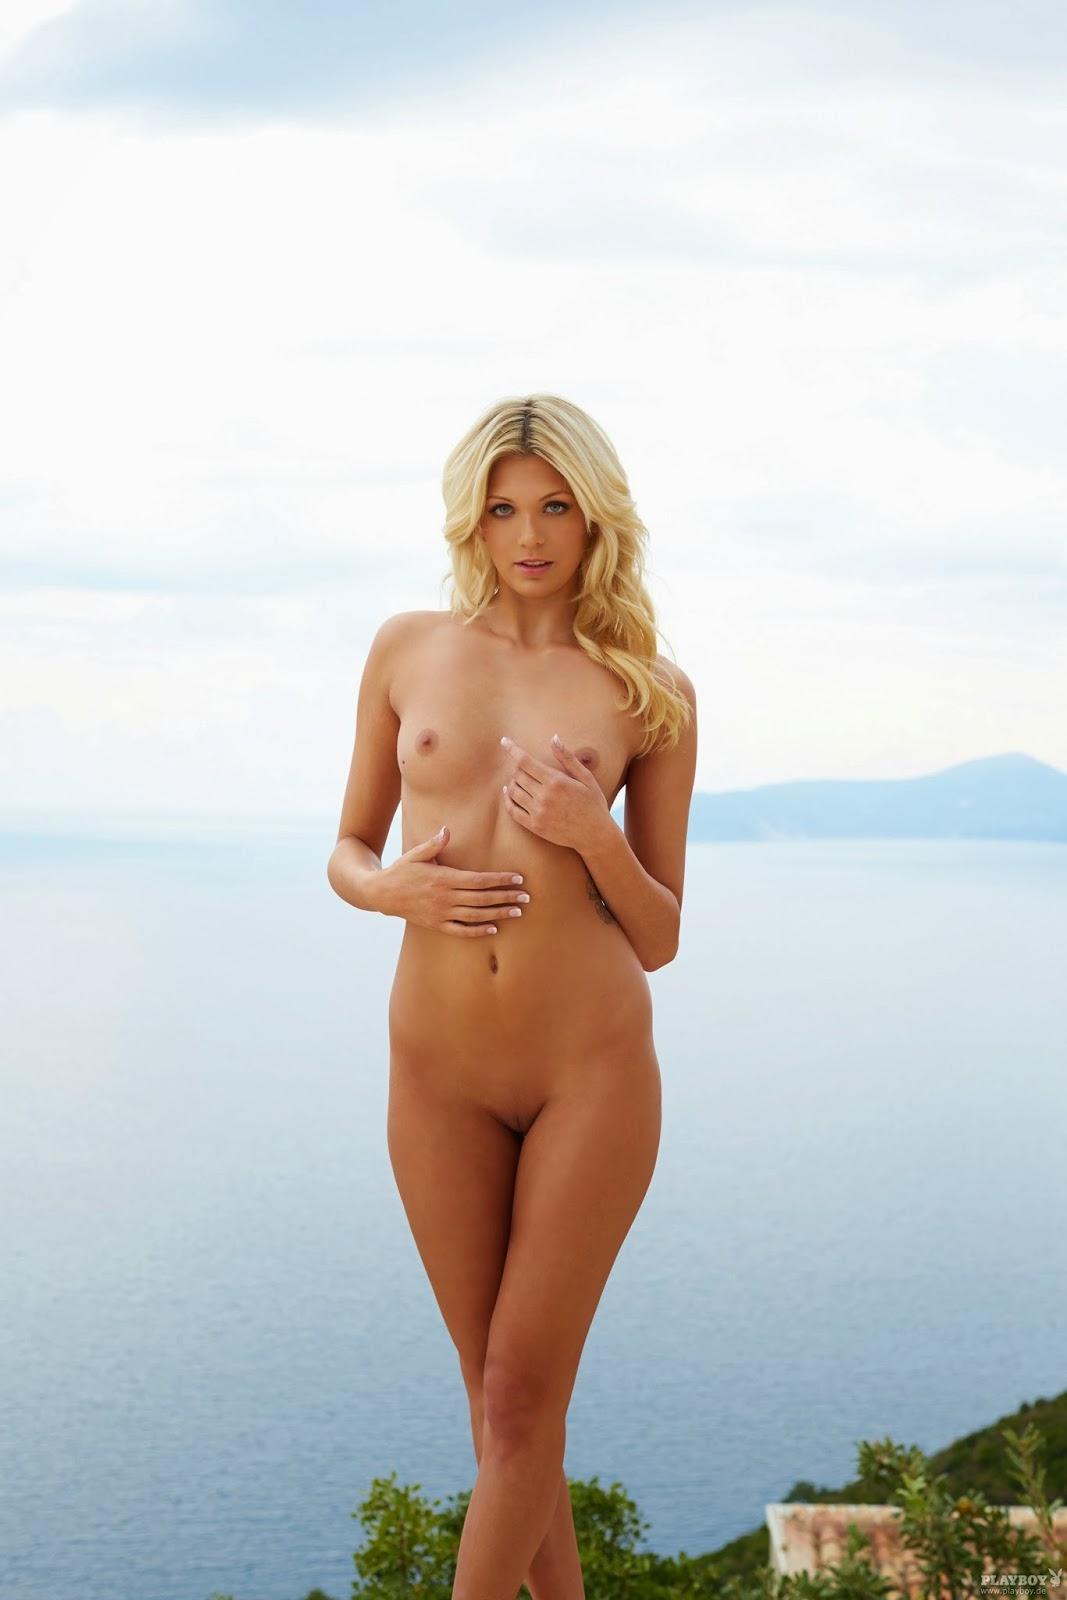 Bader nackt anna 62 Anna